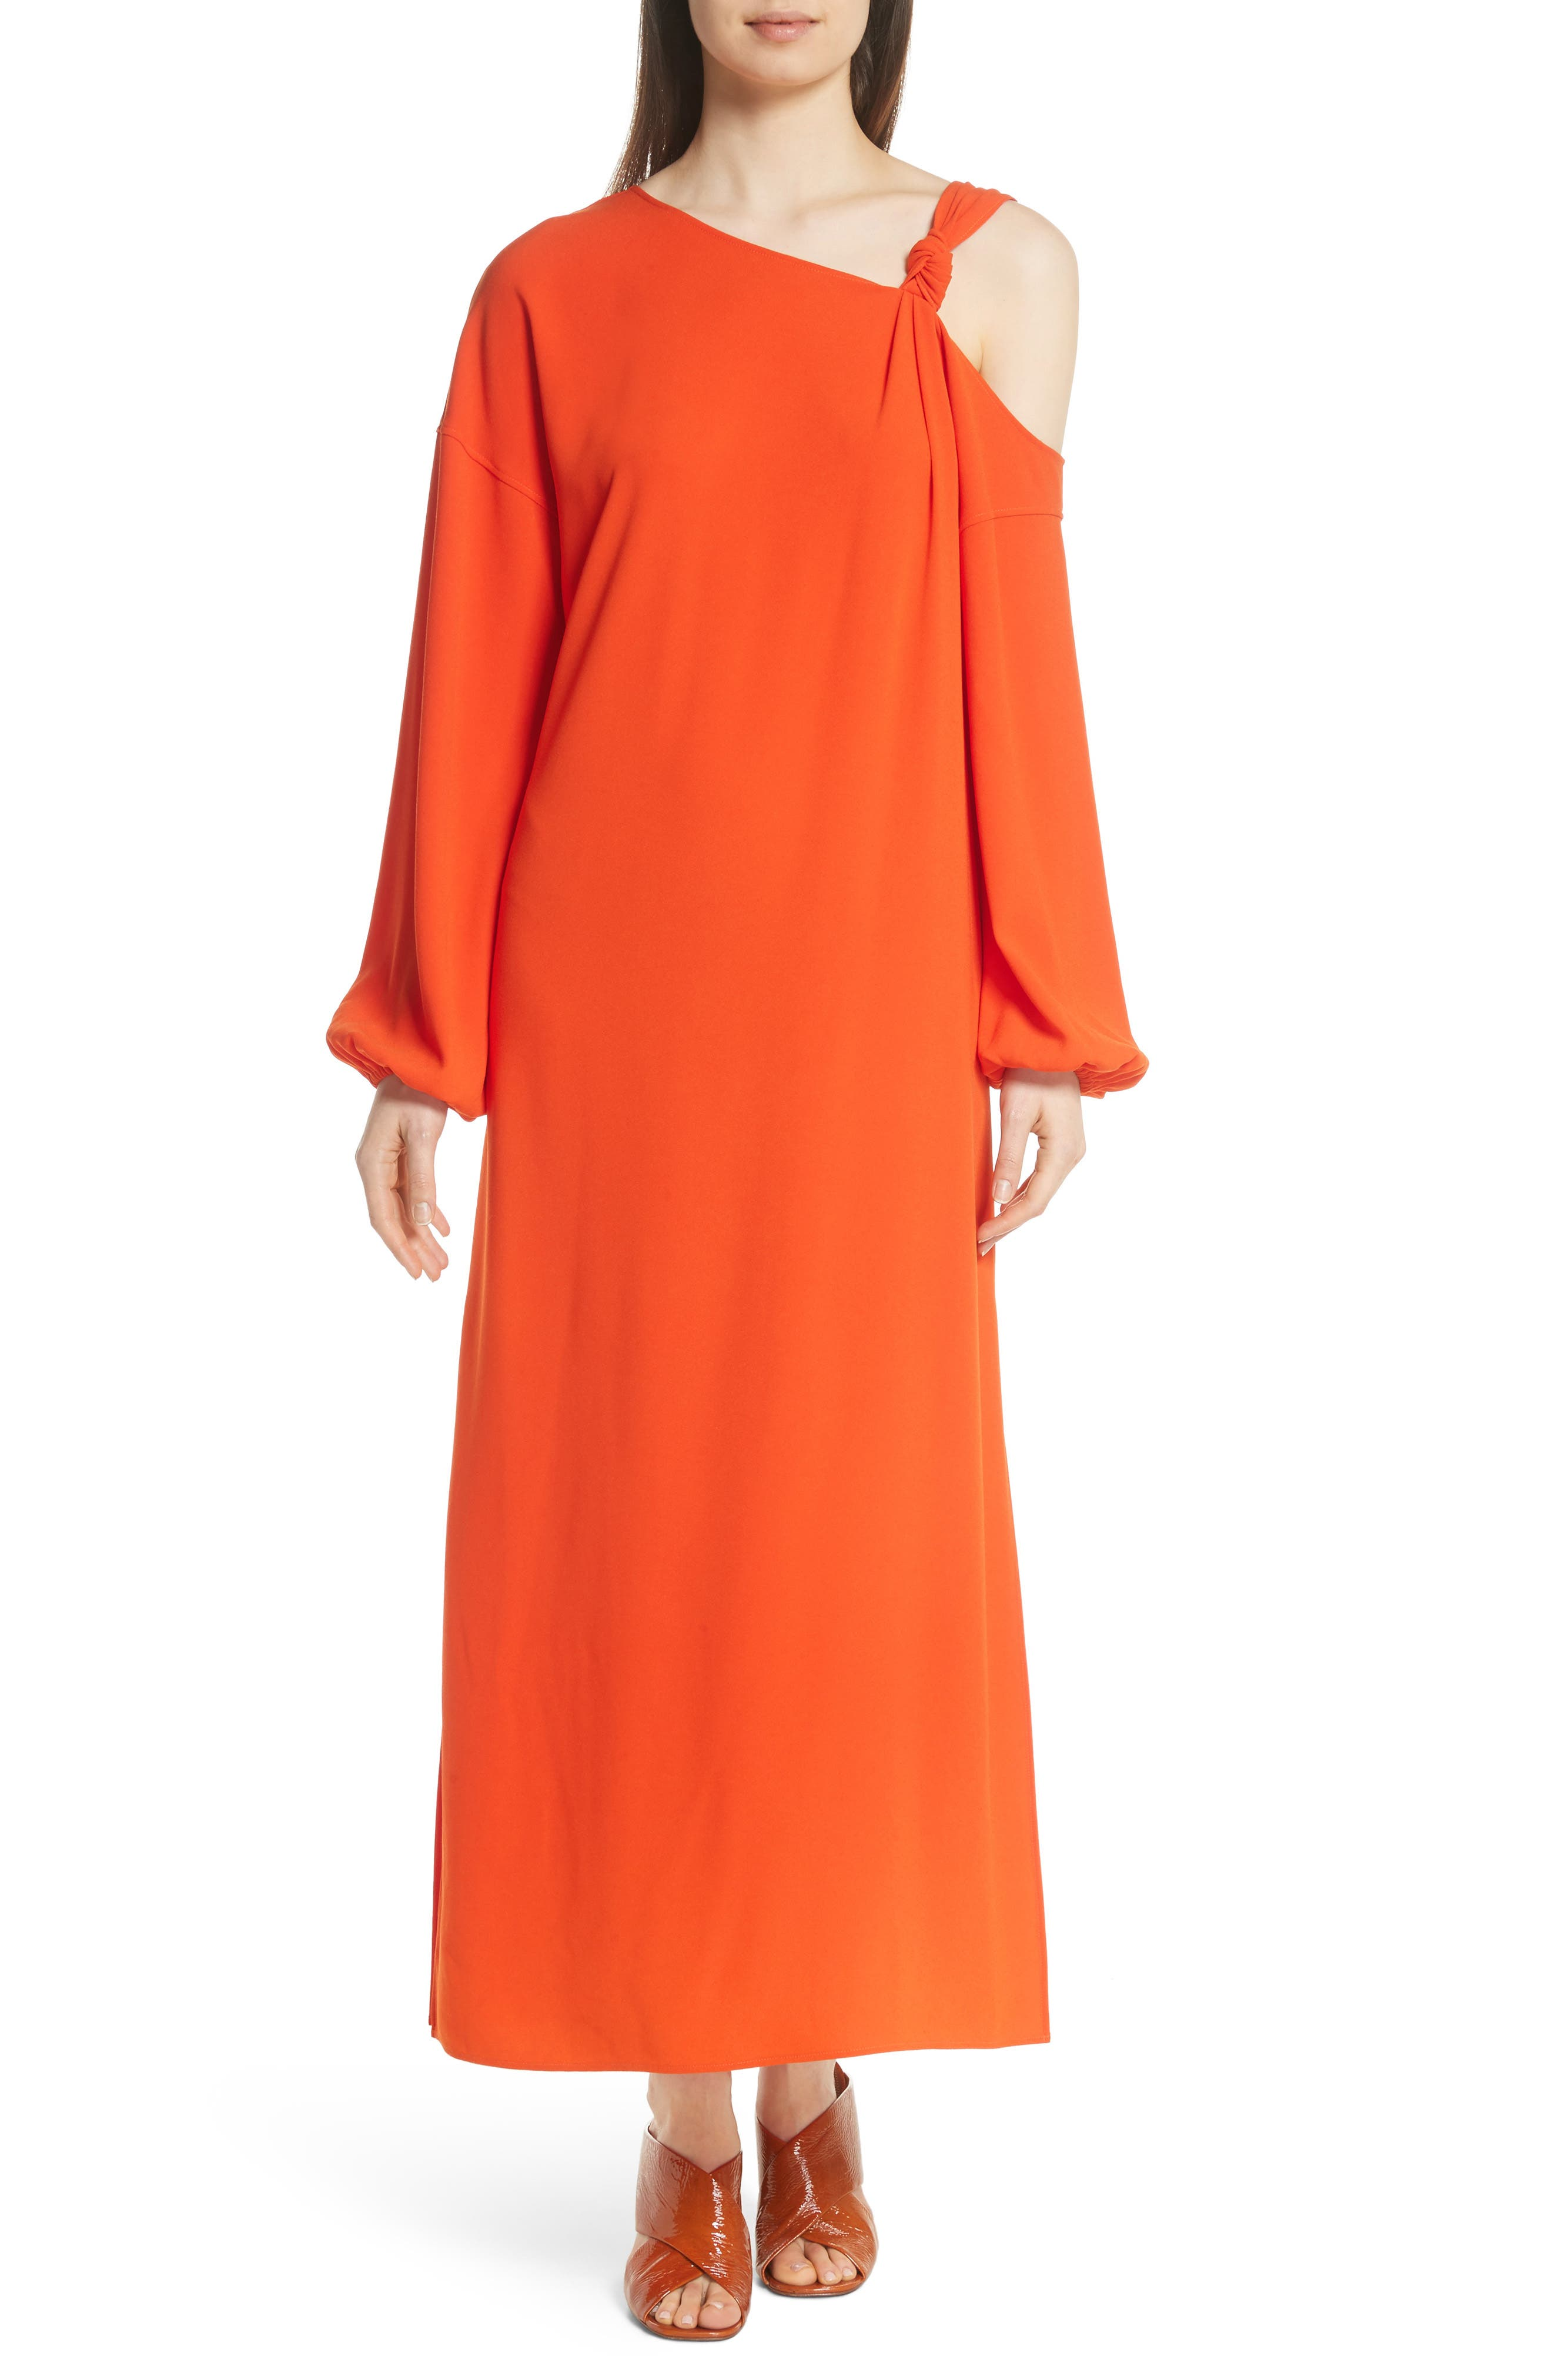 ELIZABETH AND JAMES,                             Shontae One-Shoulder Maxi Dress,                             Main thumbnail 1, color,                             807